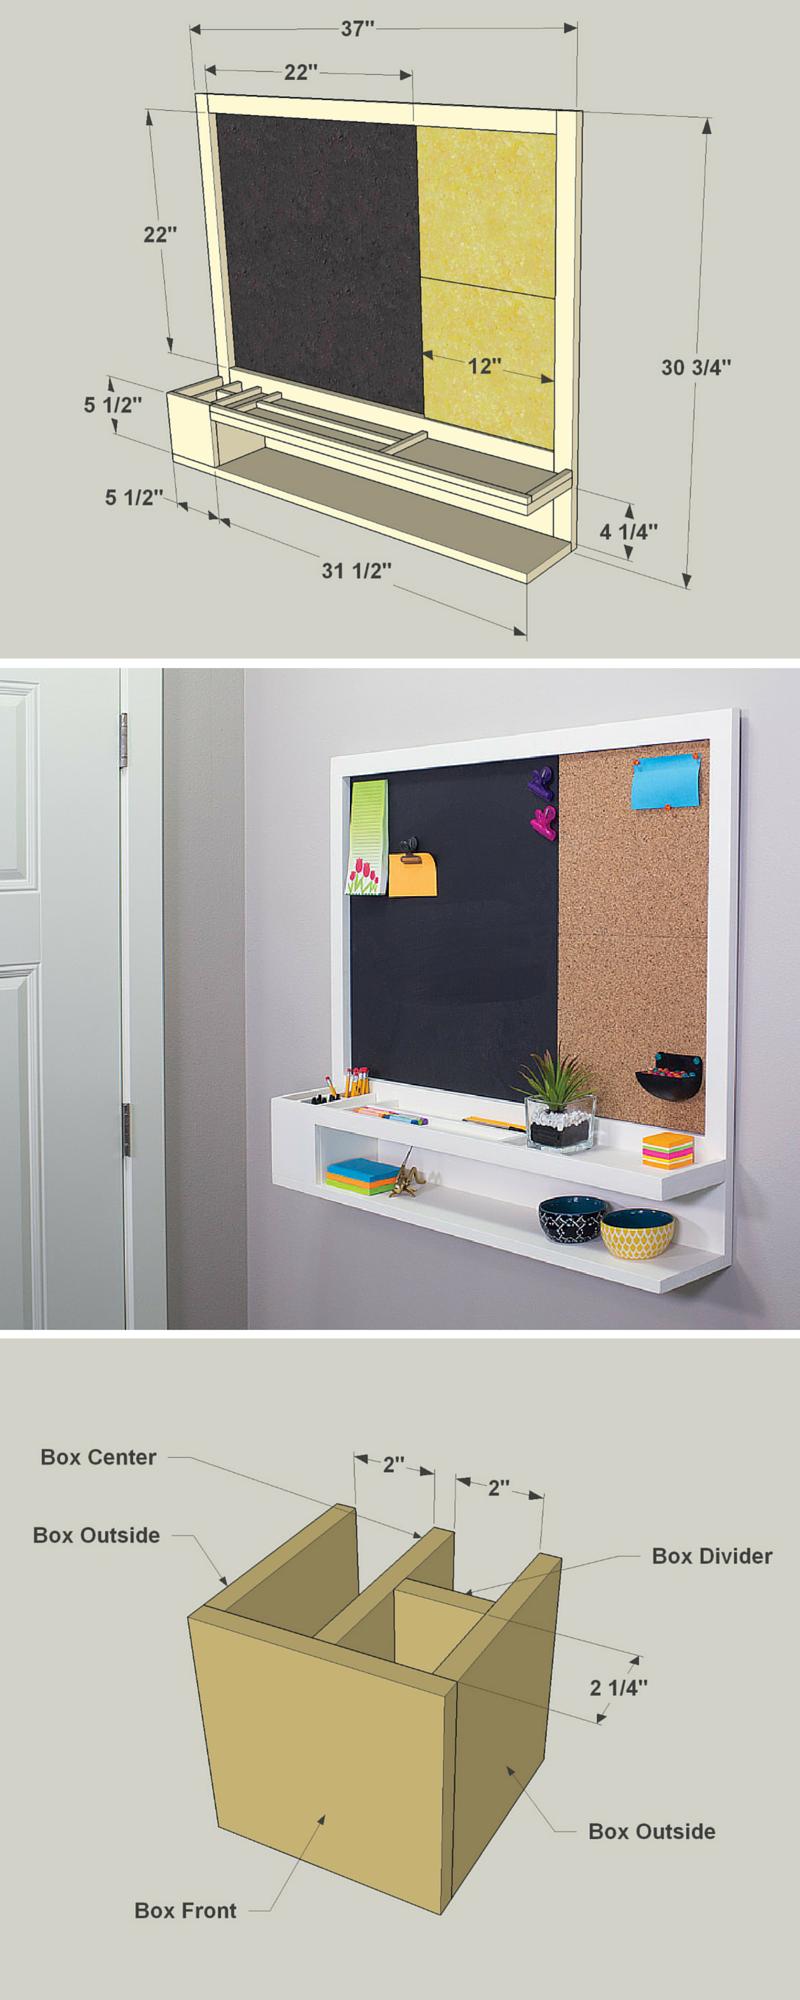 27 DIY Cool Cork Board Ideas, Instalation & Photos | Pinterest ...